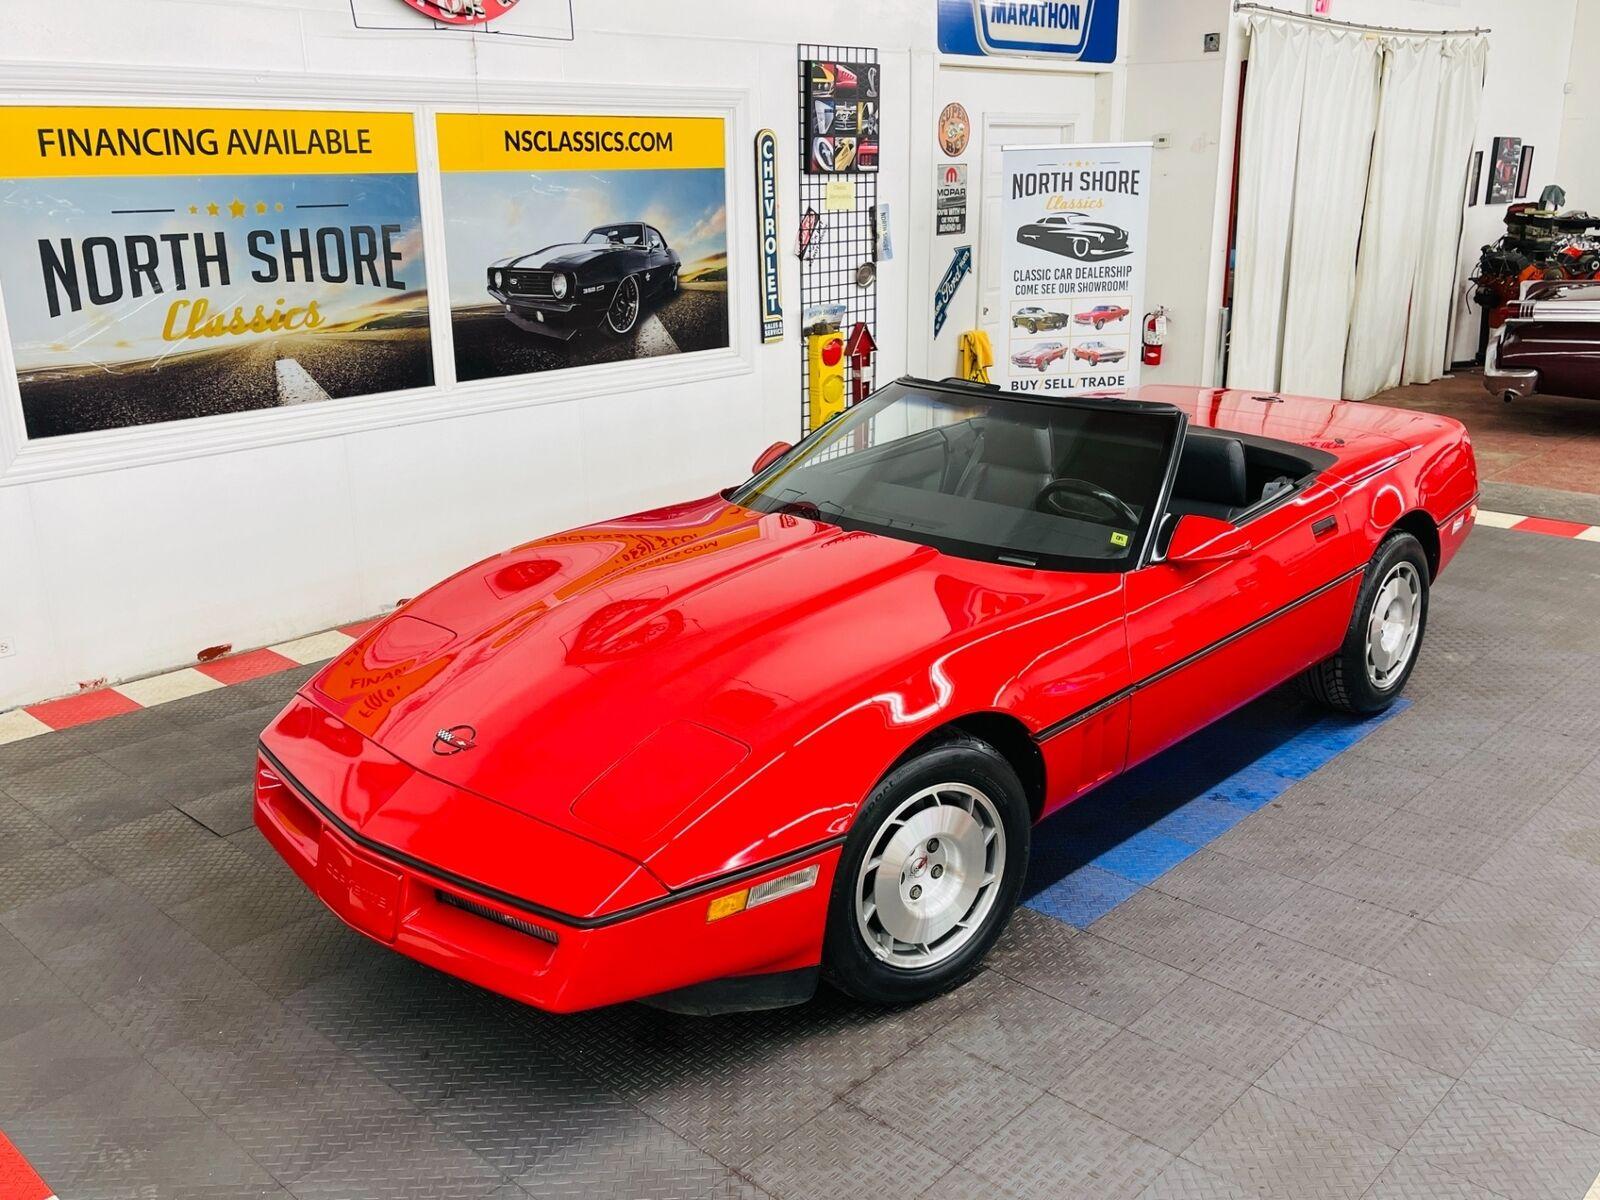 1986 Red Chevrolet Corvette Convertible  | C4 Corvette Photo 1